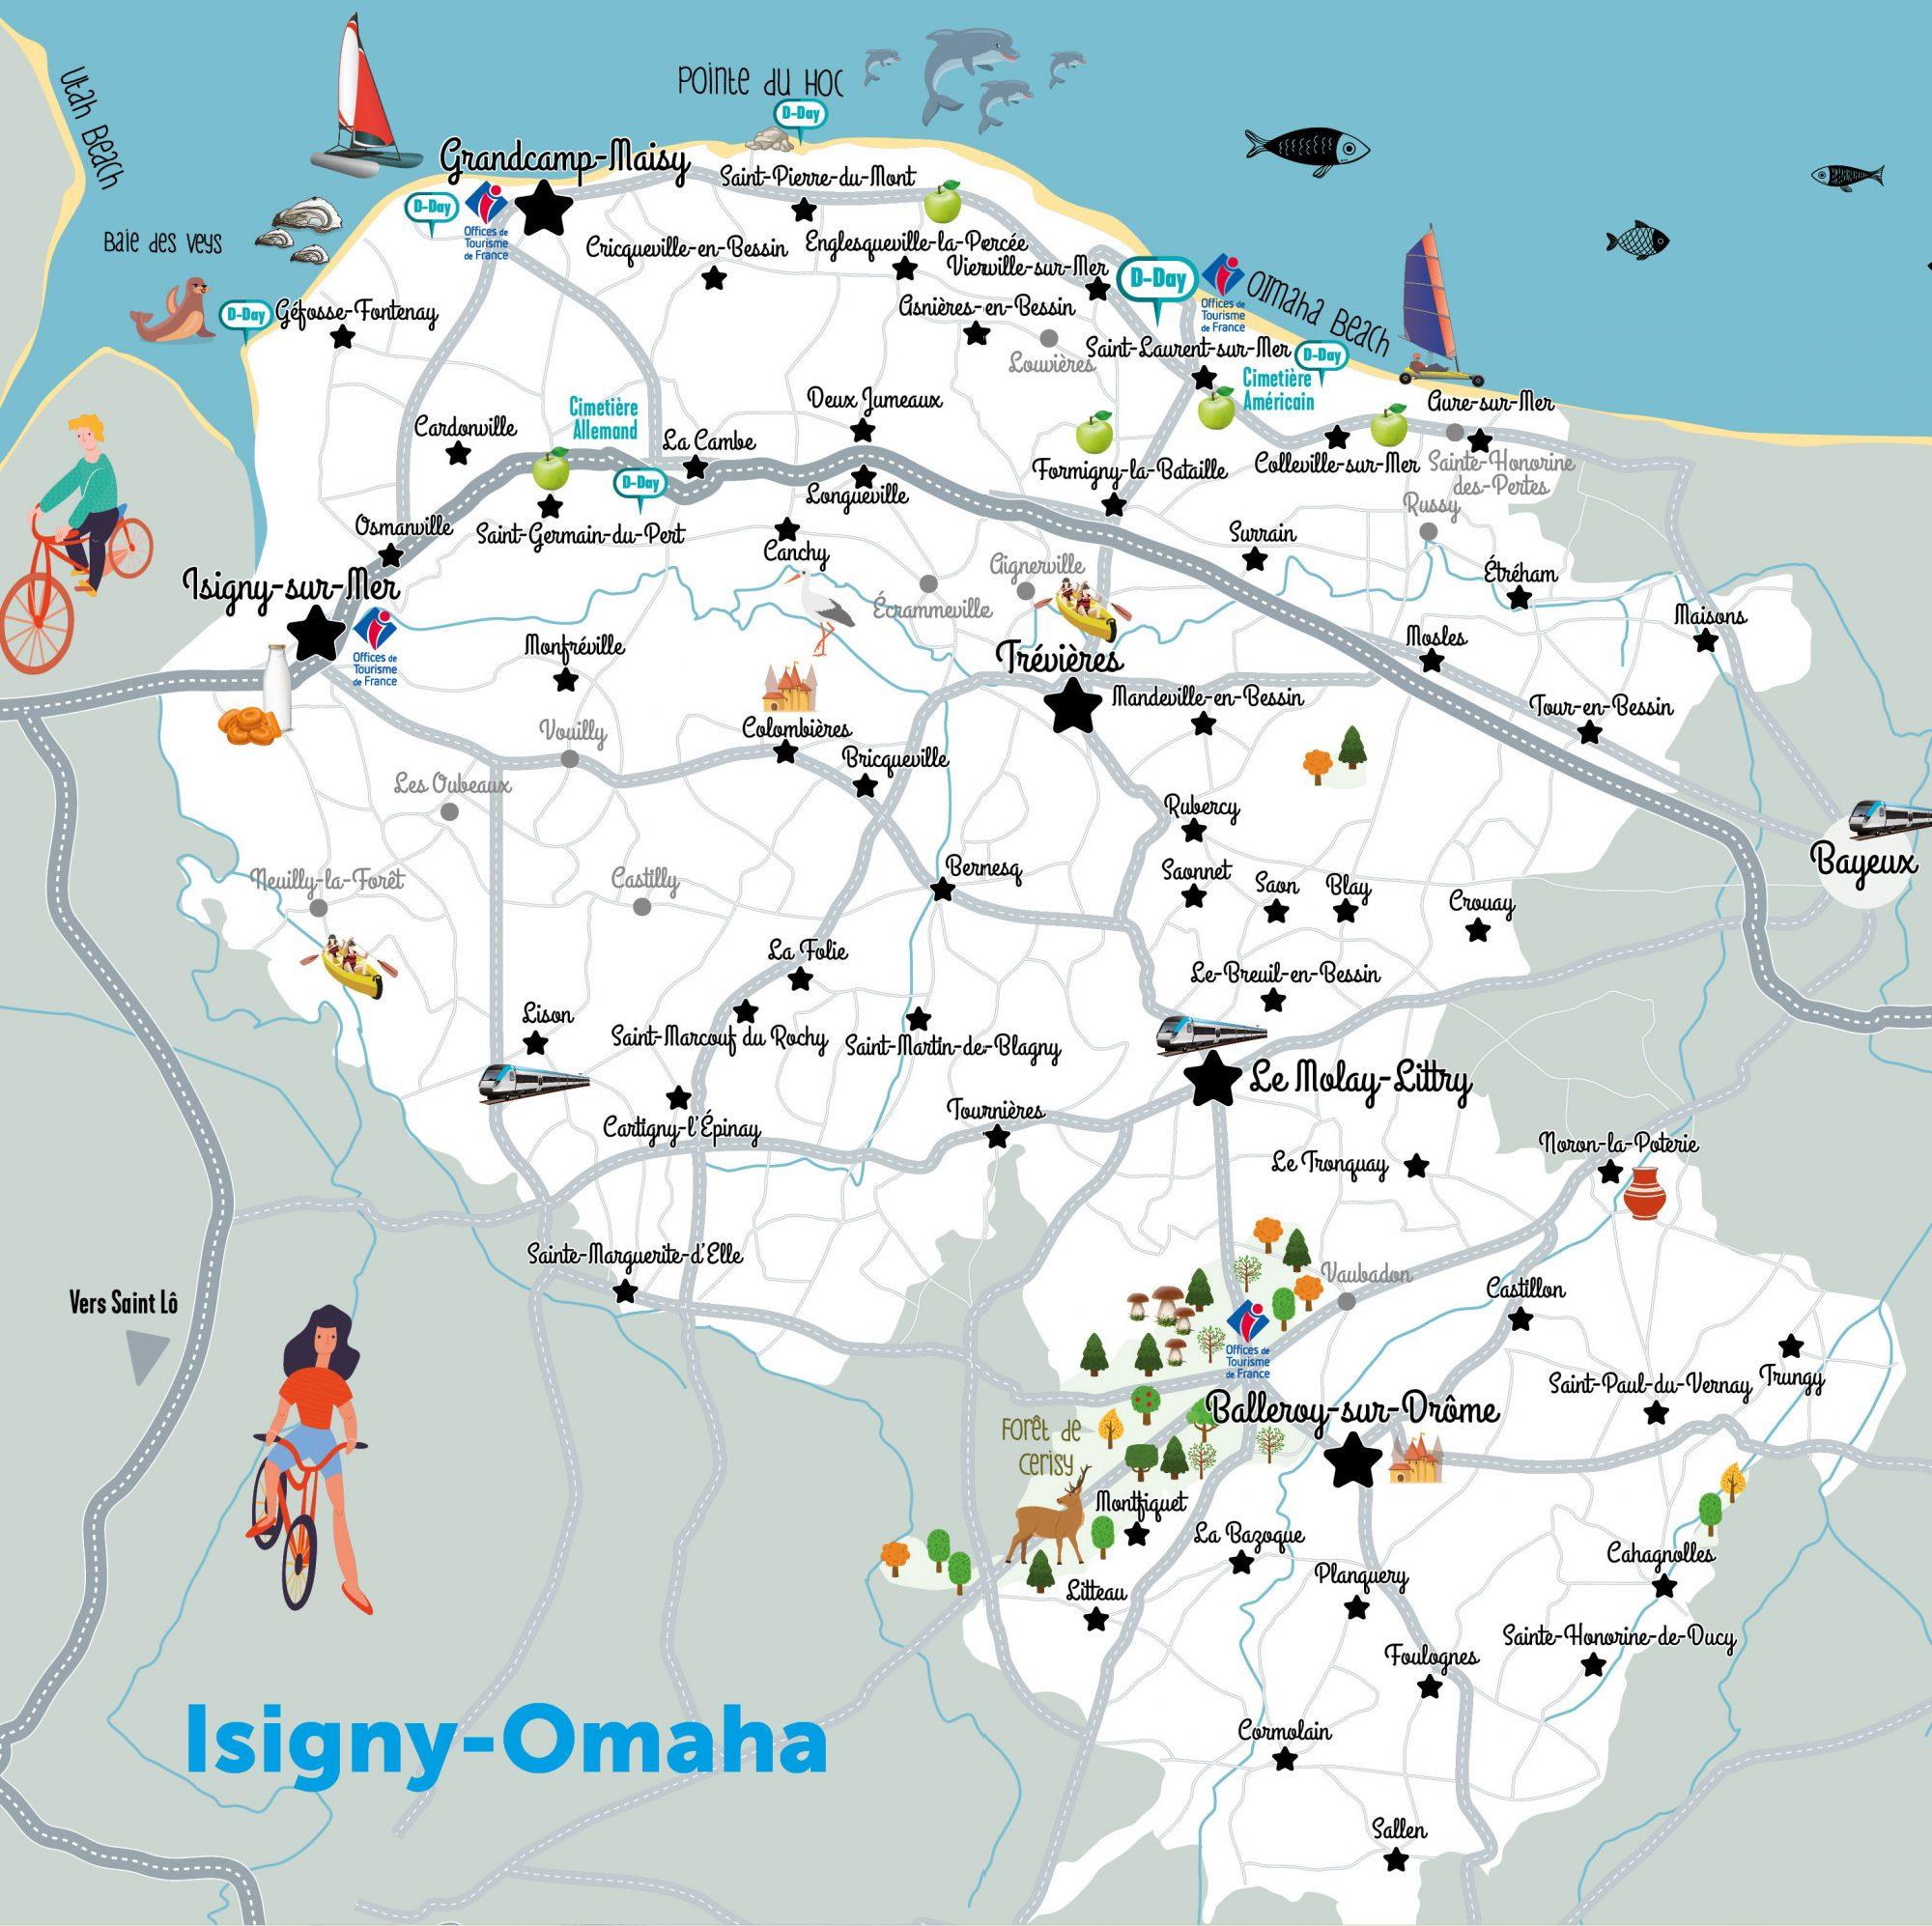 carte de la destination touristique d'Isigny-Omaha